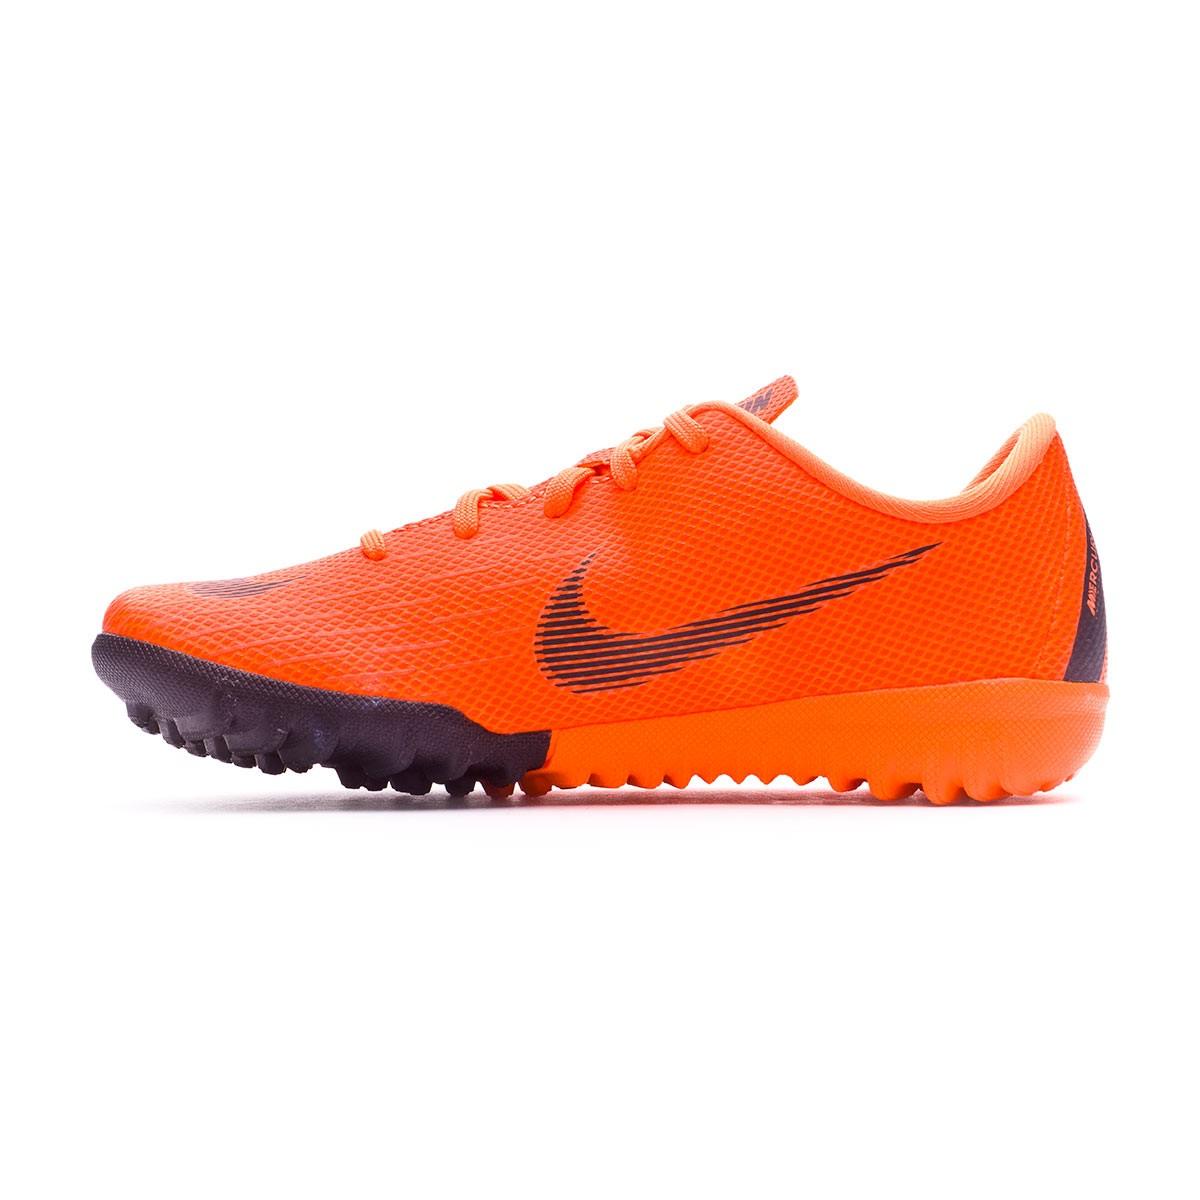 d88e45d05fc1 Football Boot Nike Kids Mercurial VaporX XII Academy PS Turf Total orange- Black-Volt - Football store Fútbol Emotion